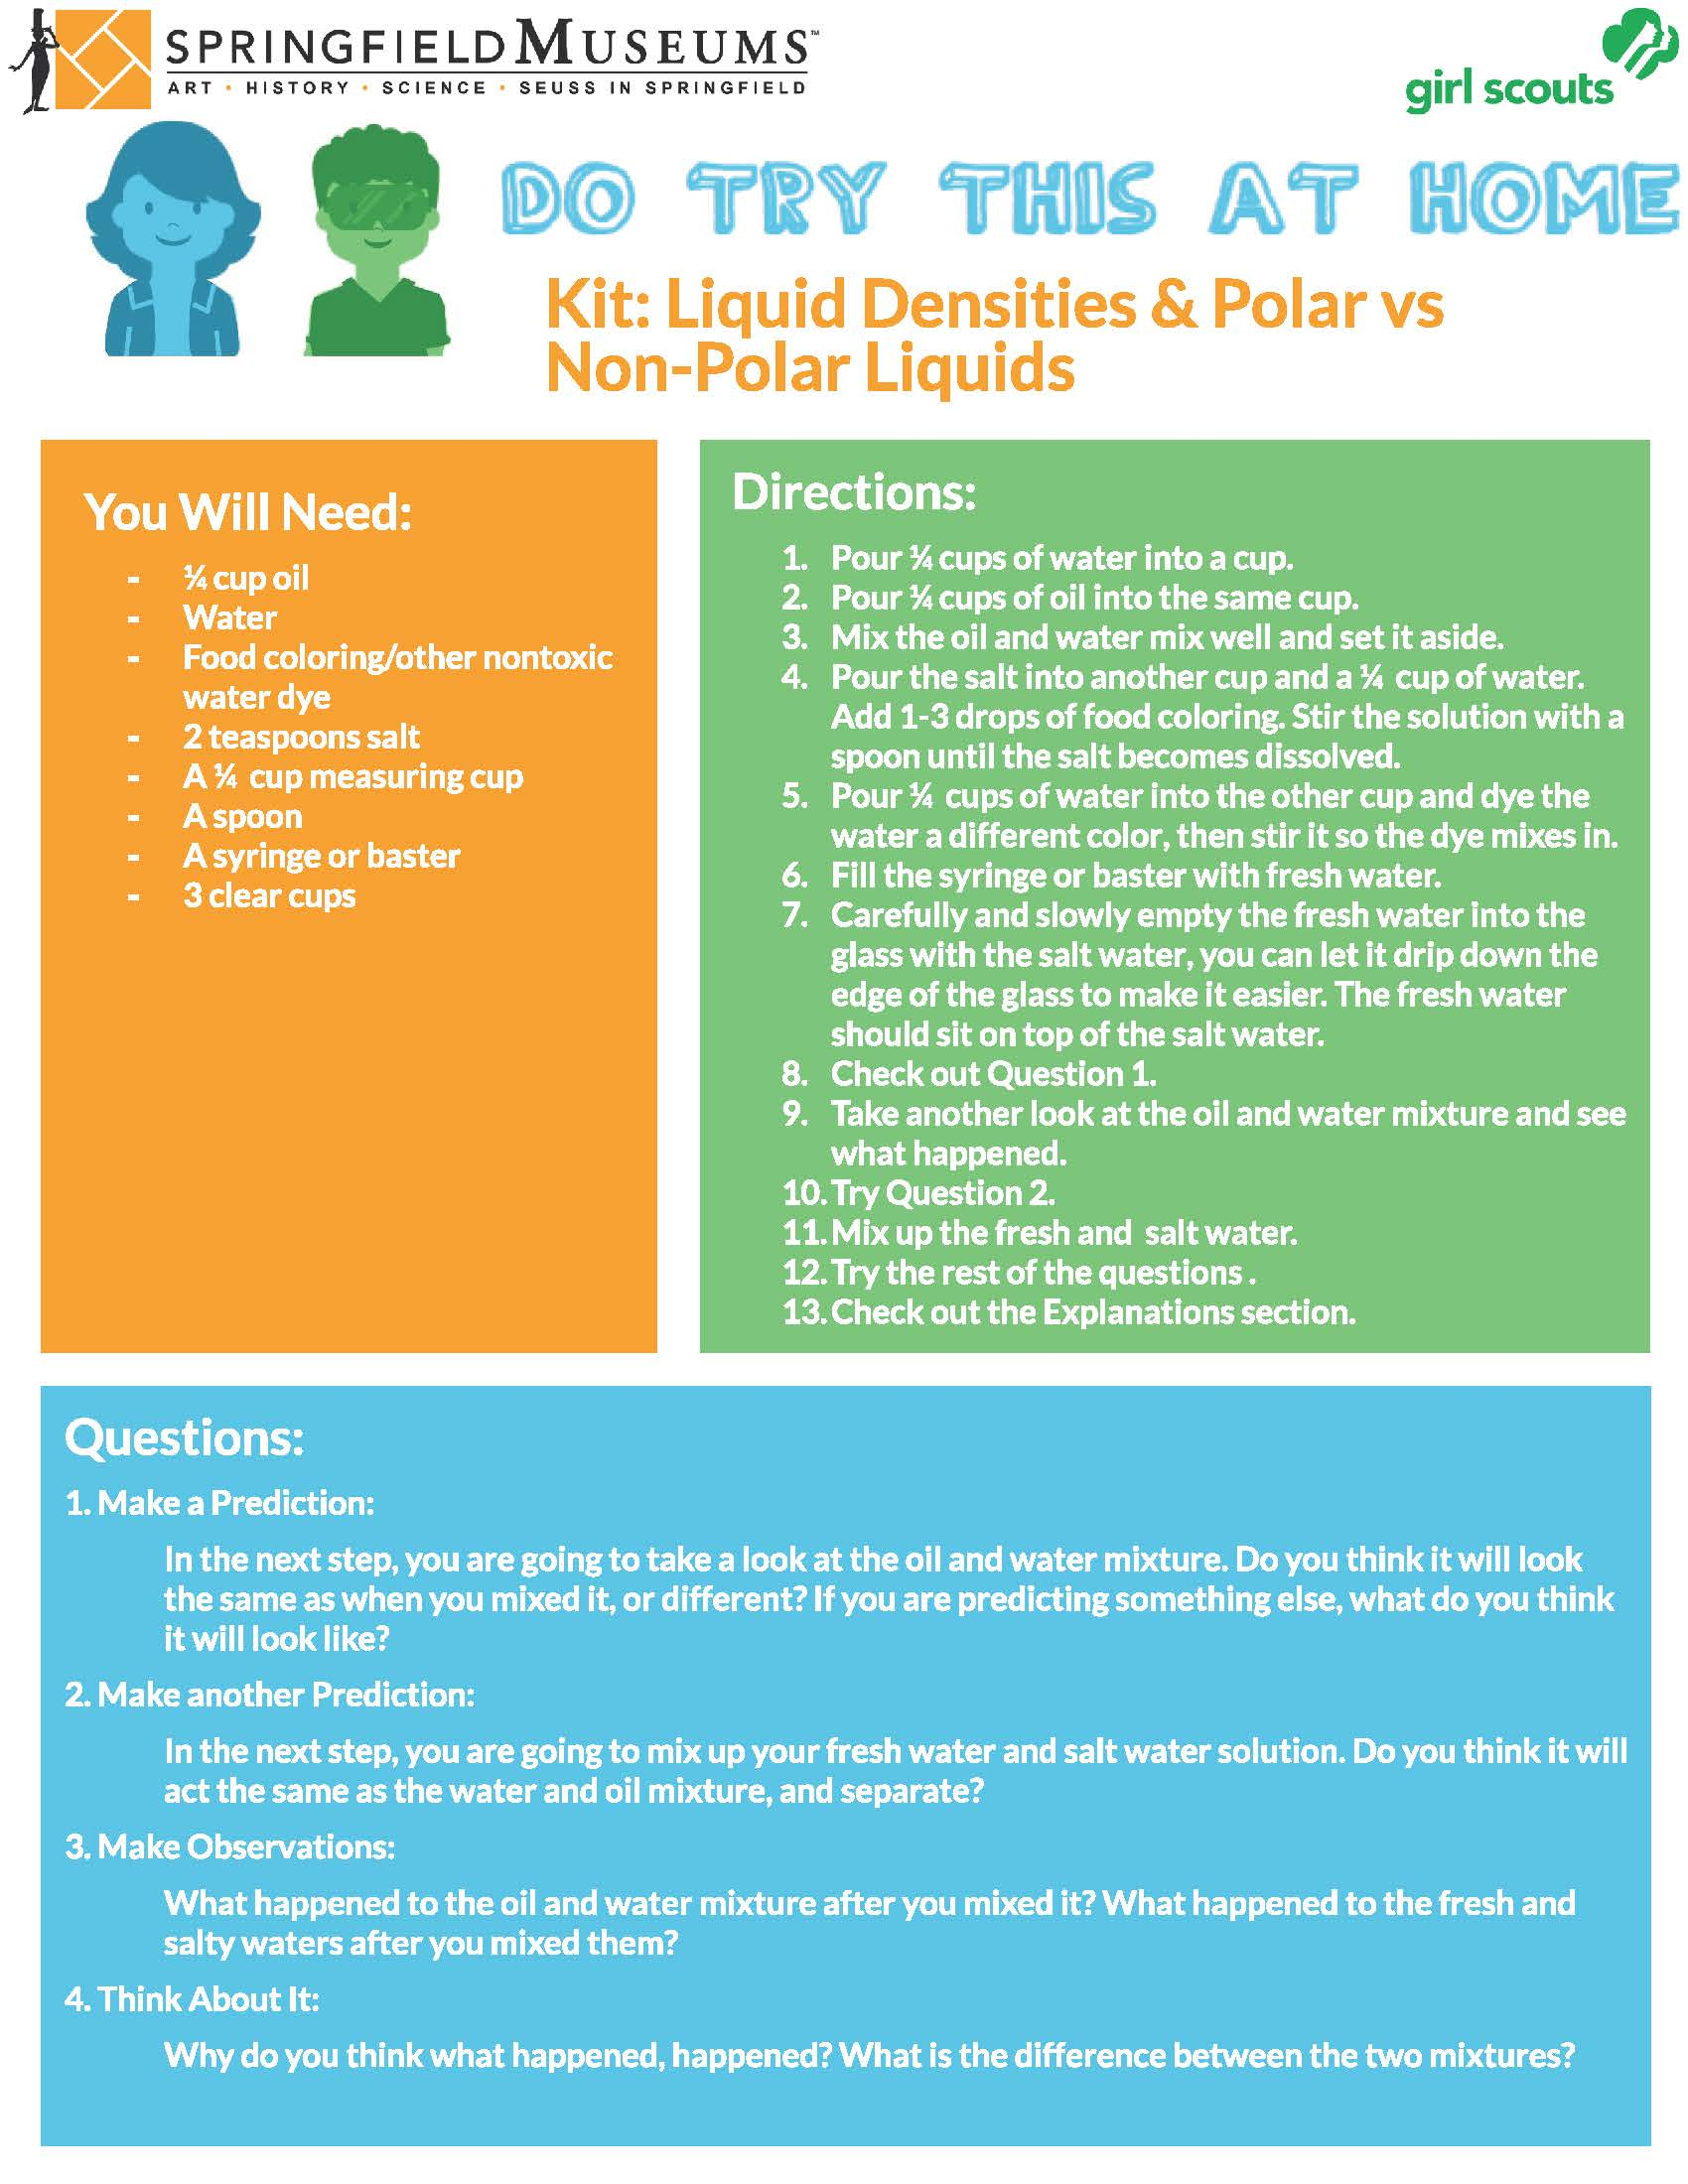 Liquid Densities & Polar vs. Non-Polar Liquids